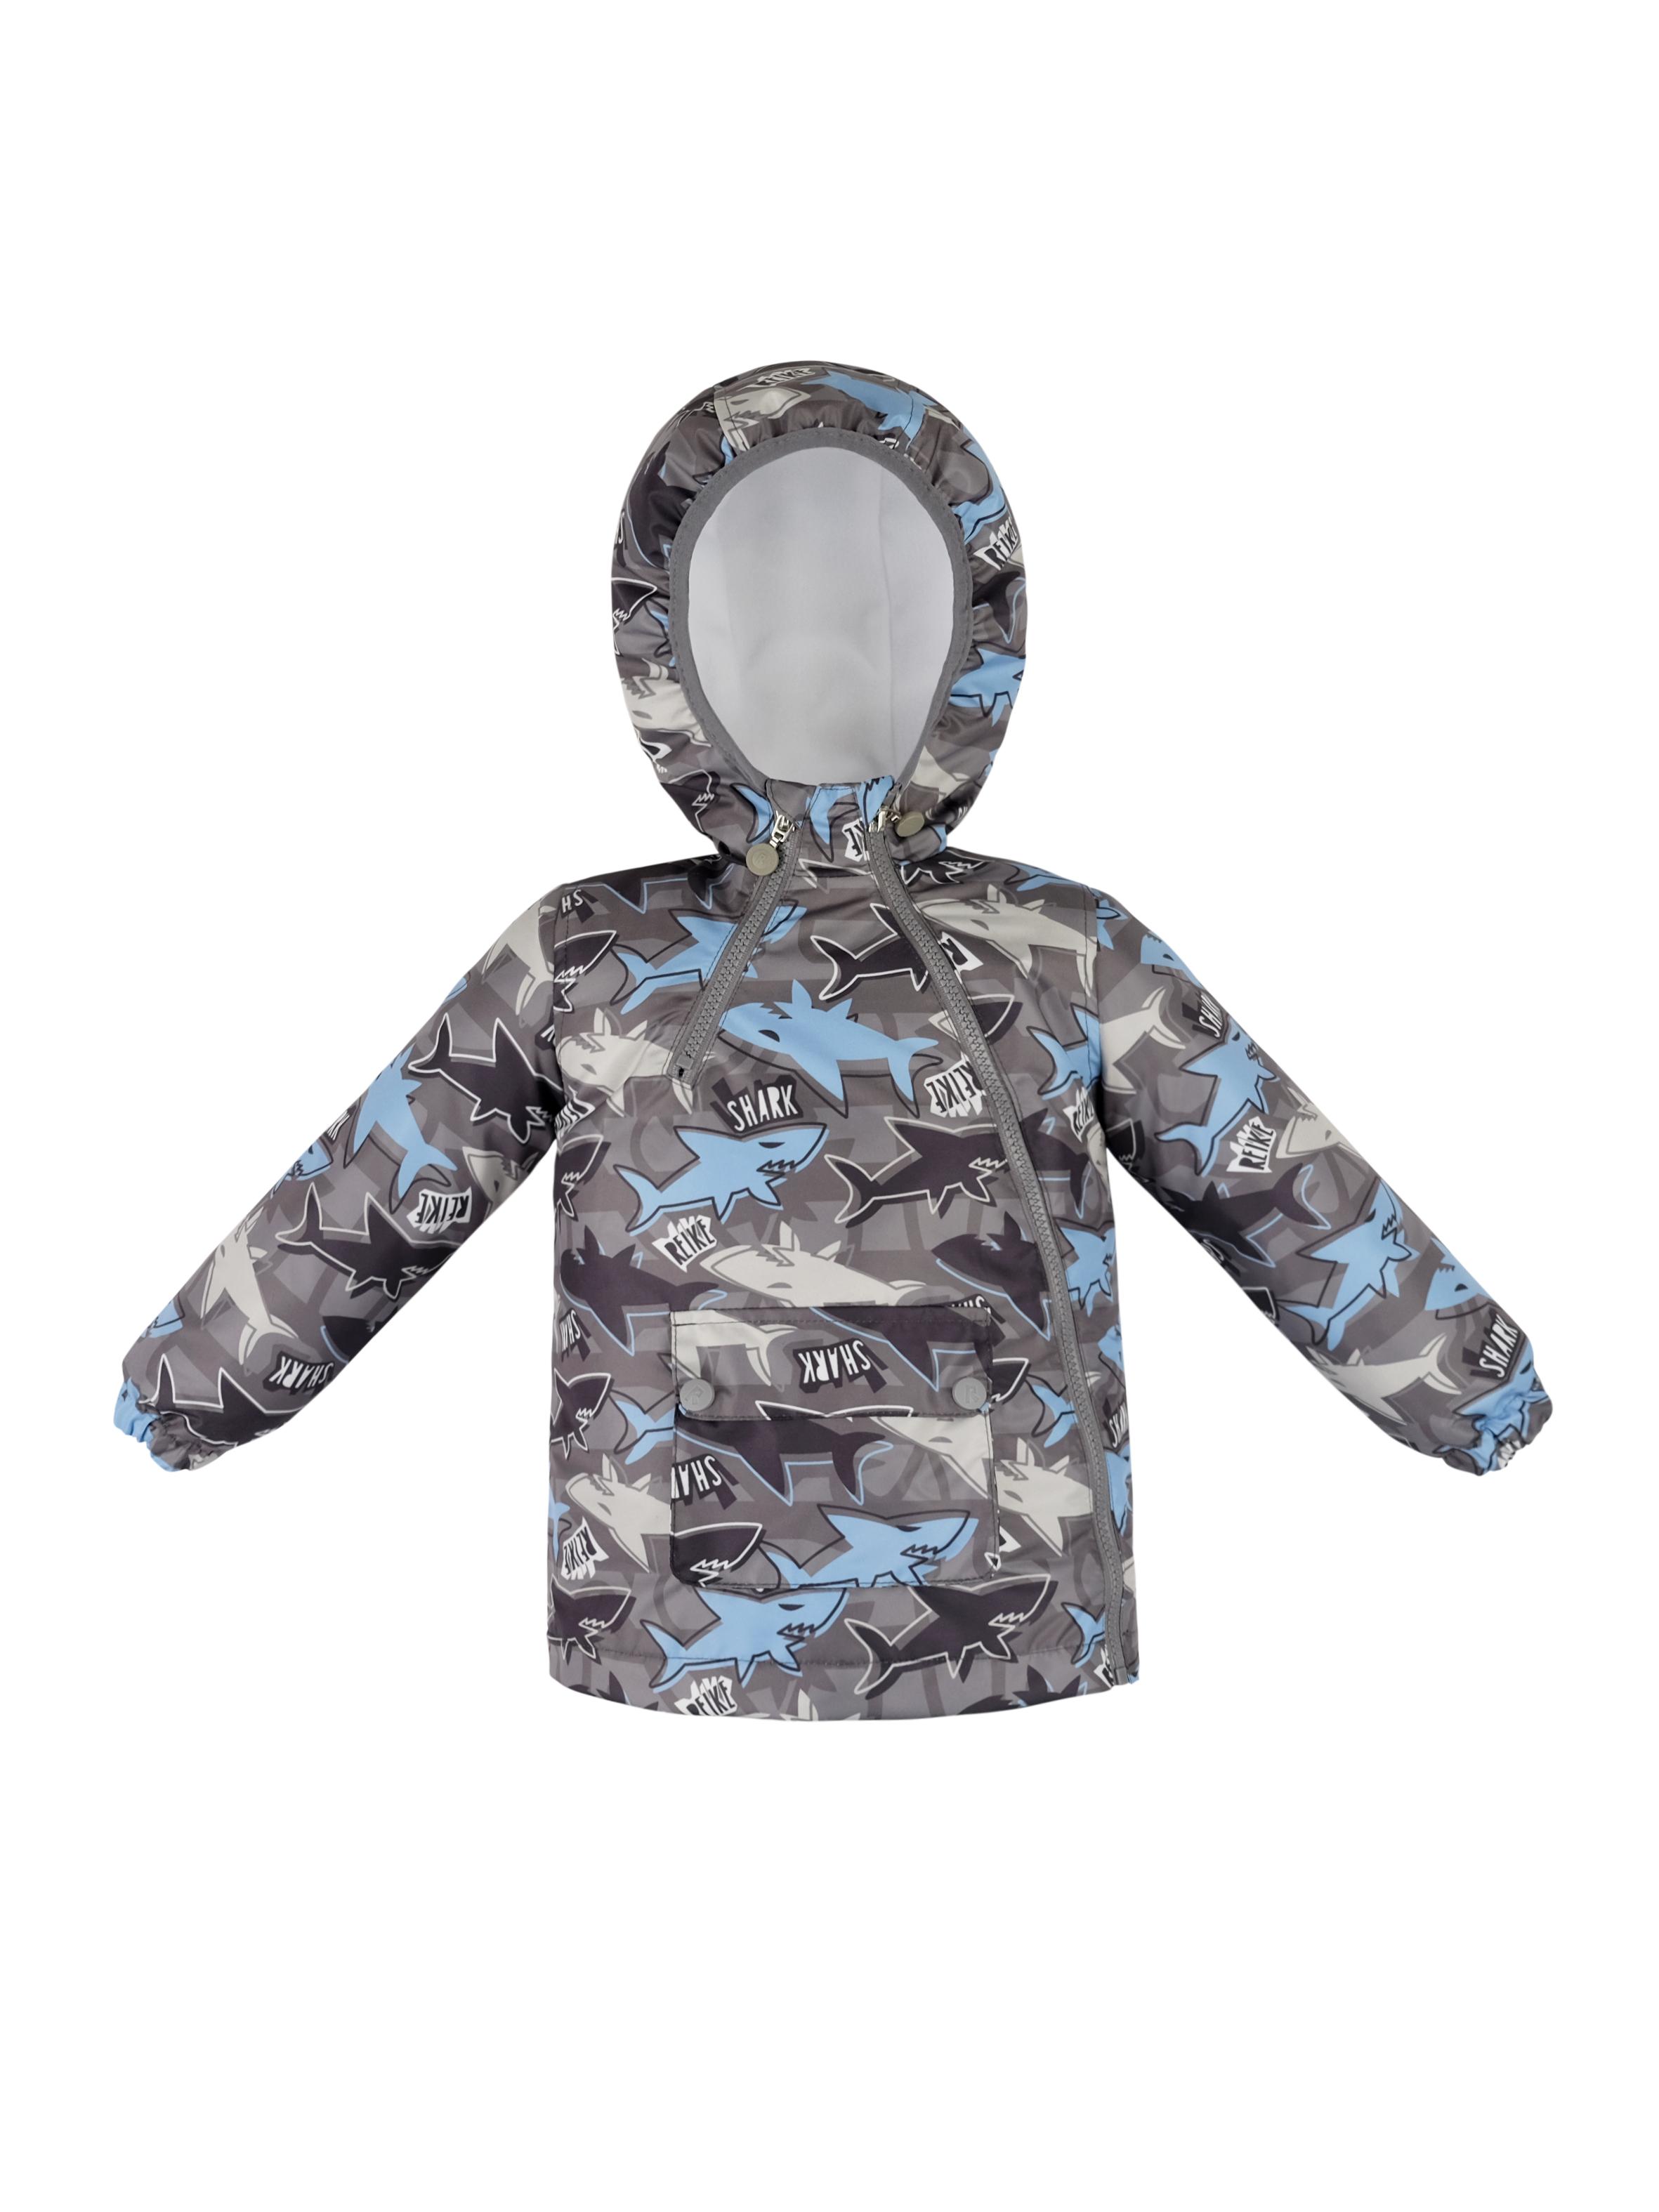 Куртка детская Reike Small sharks grey р.86